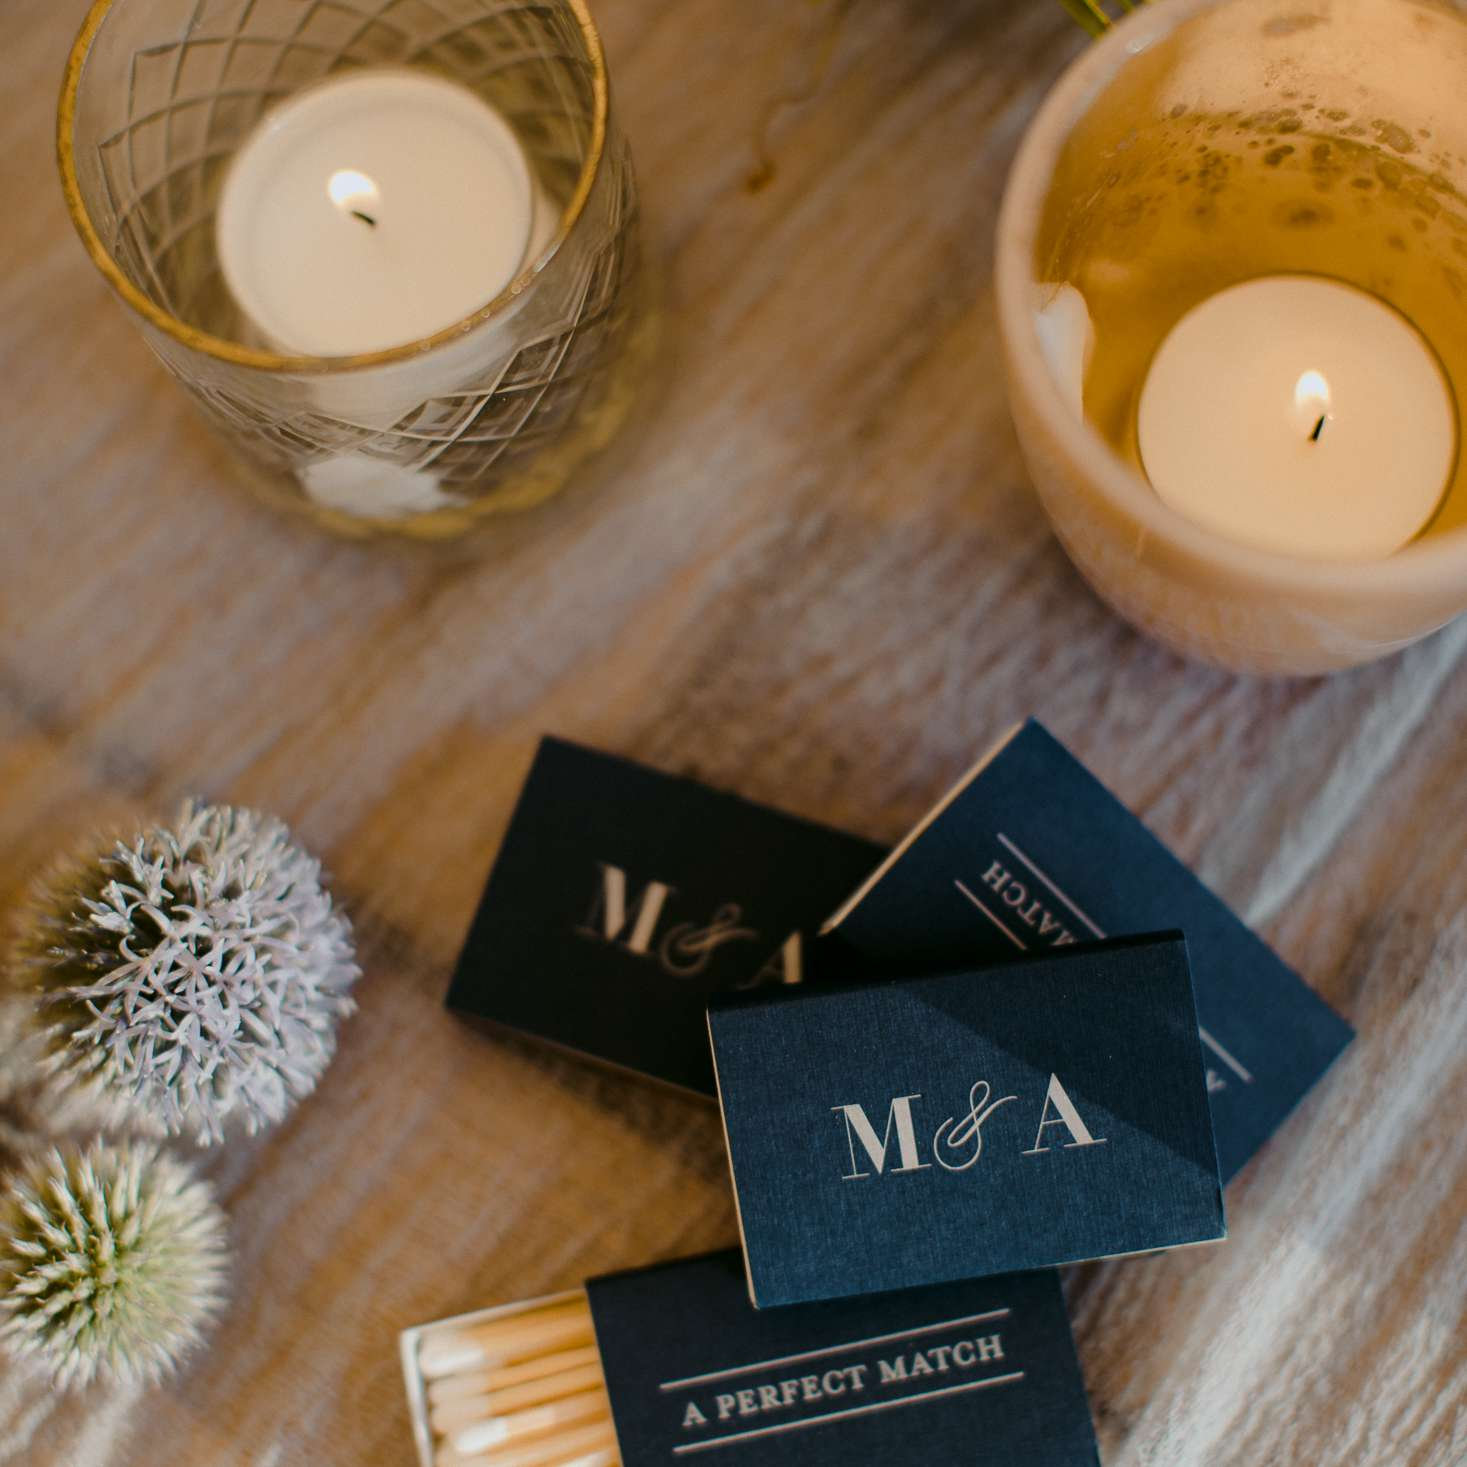 at-home rustic massachusetts wedding, matches wedding favor